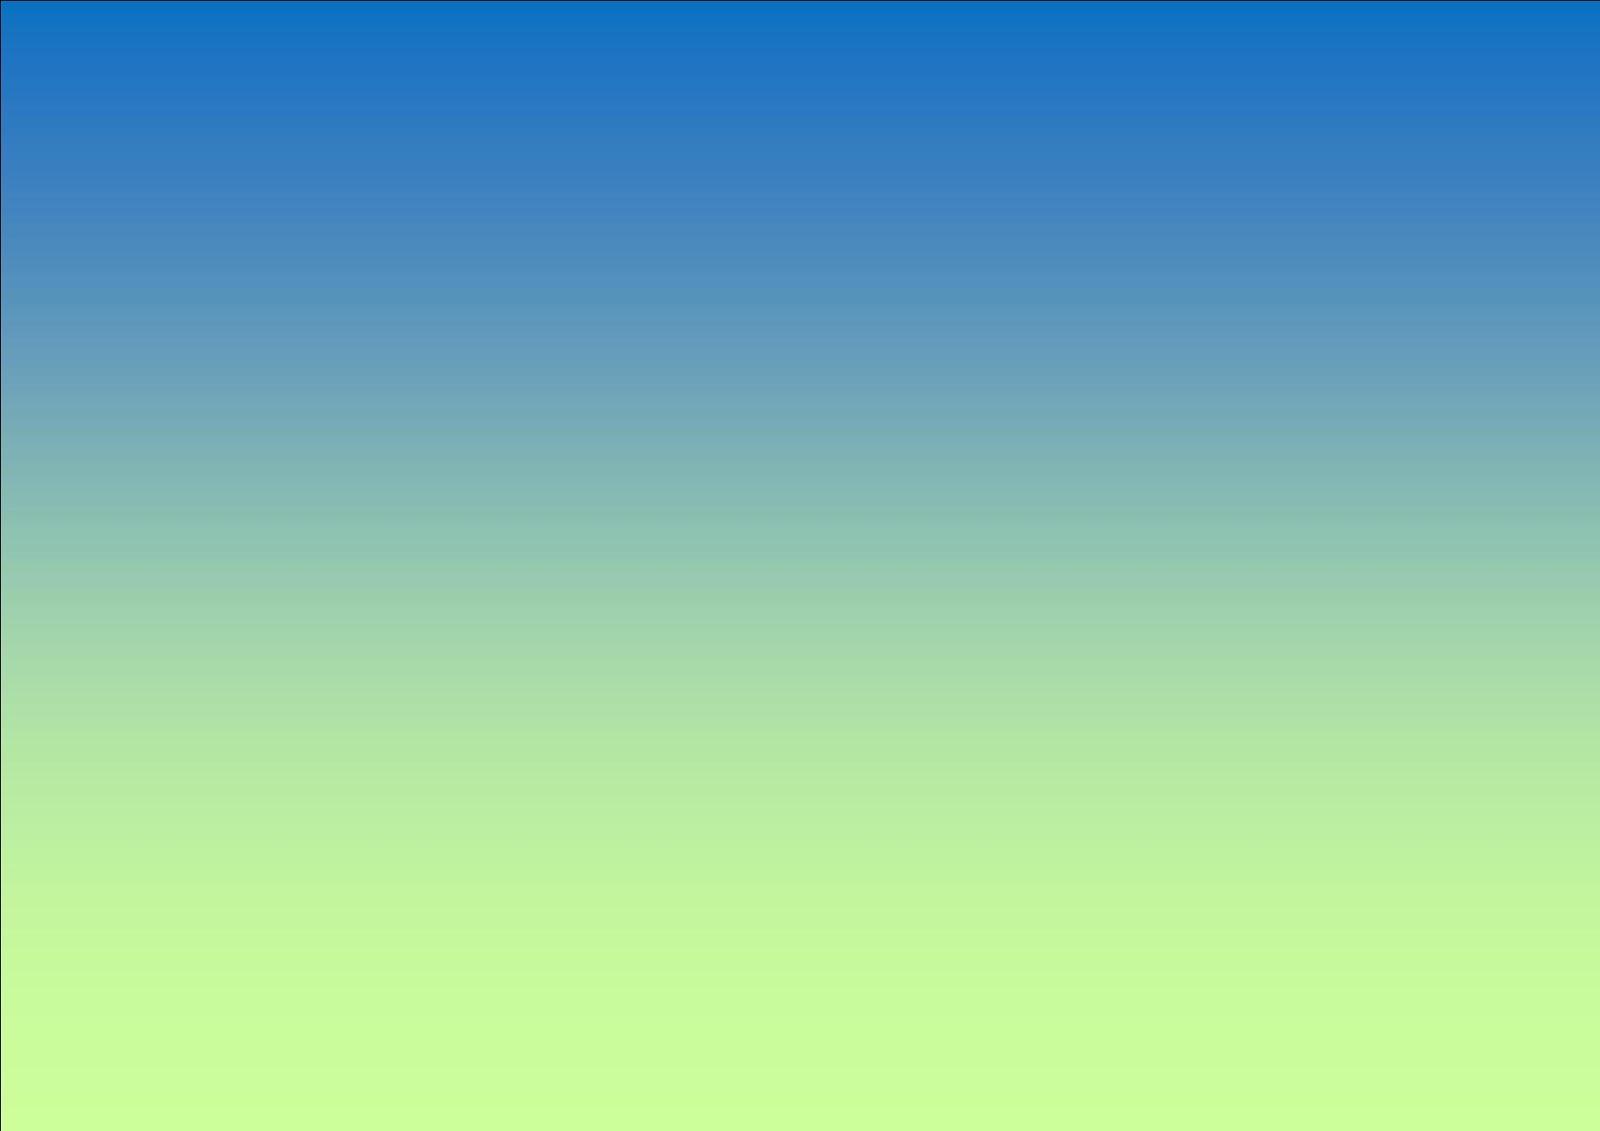 Zoom dise o y fotografia fondos degradee de colores pasteles for De colores de colores